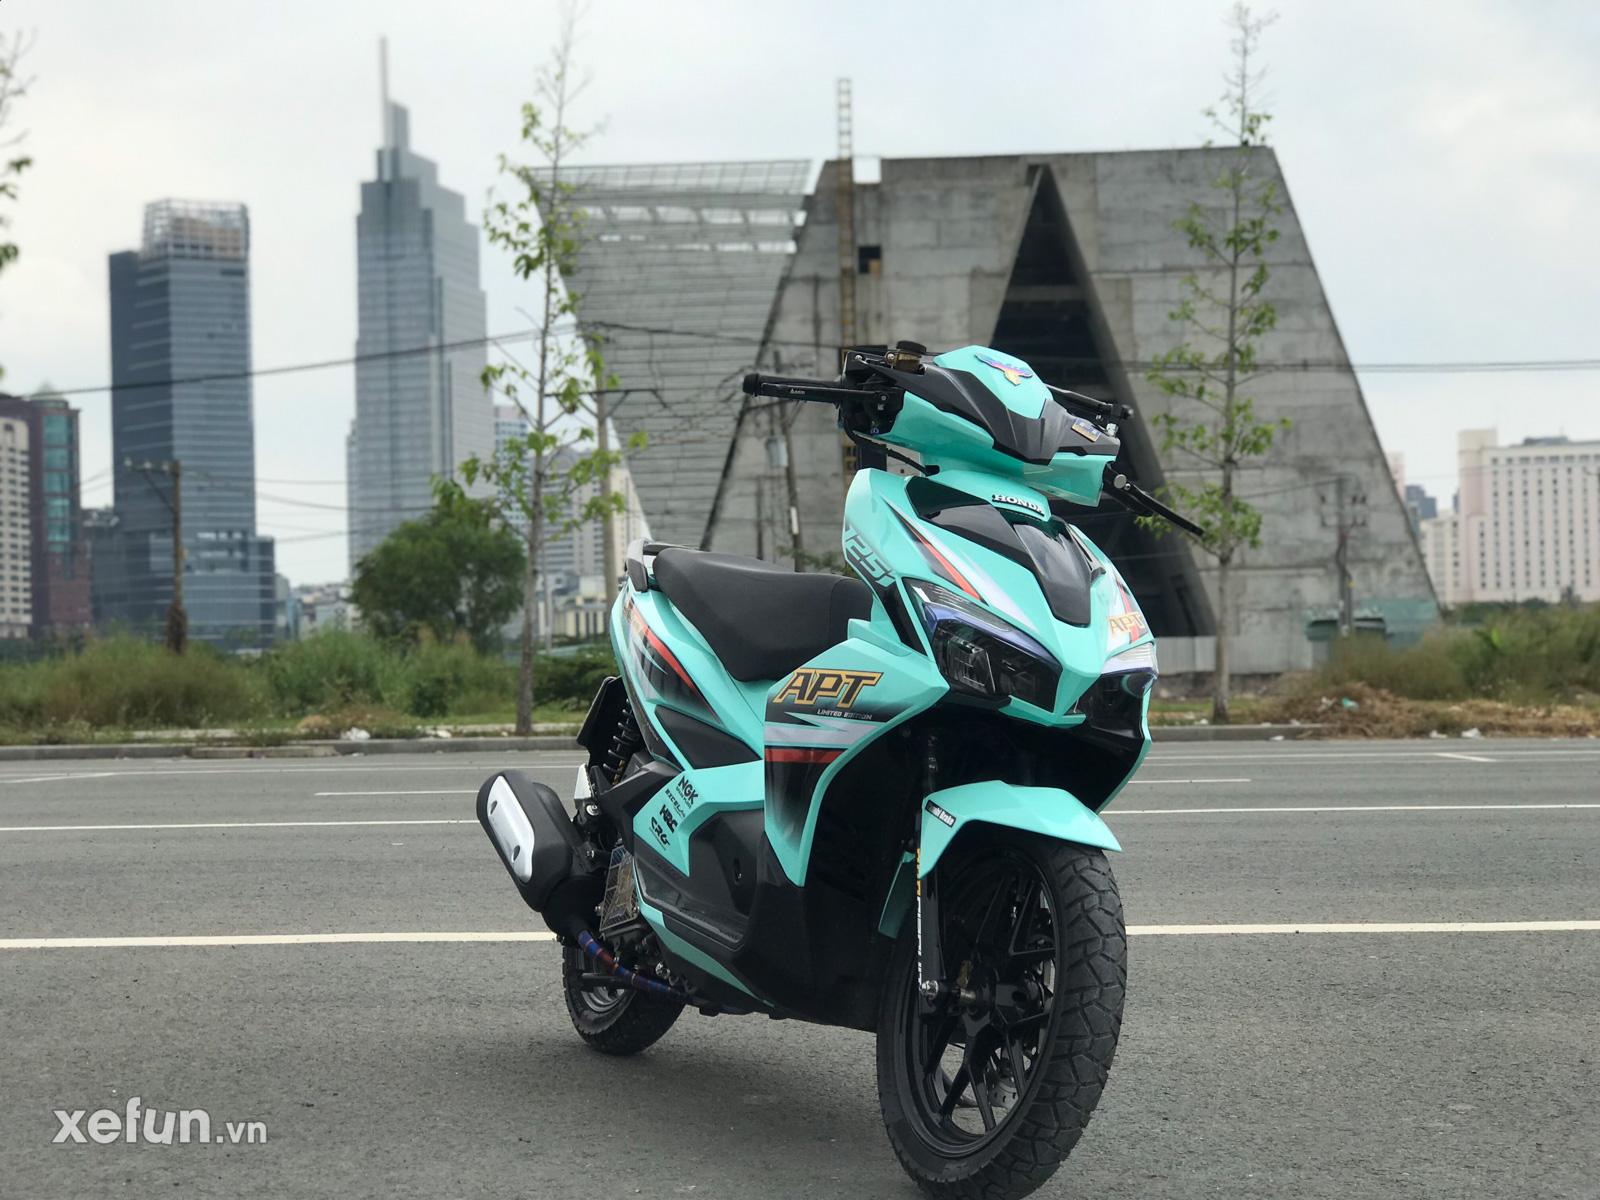 Honda Airblade 125 độ - Xefun